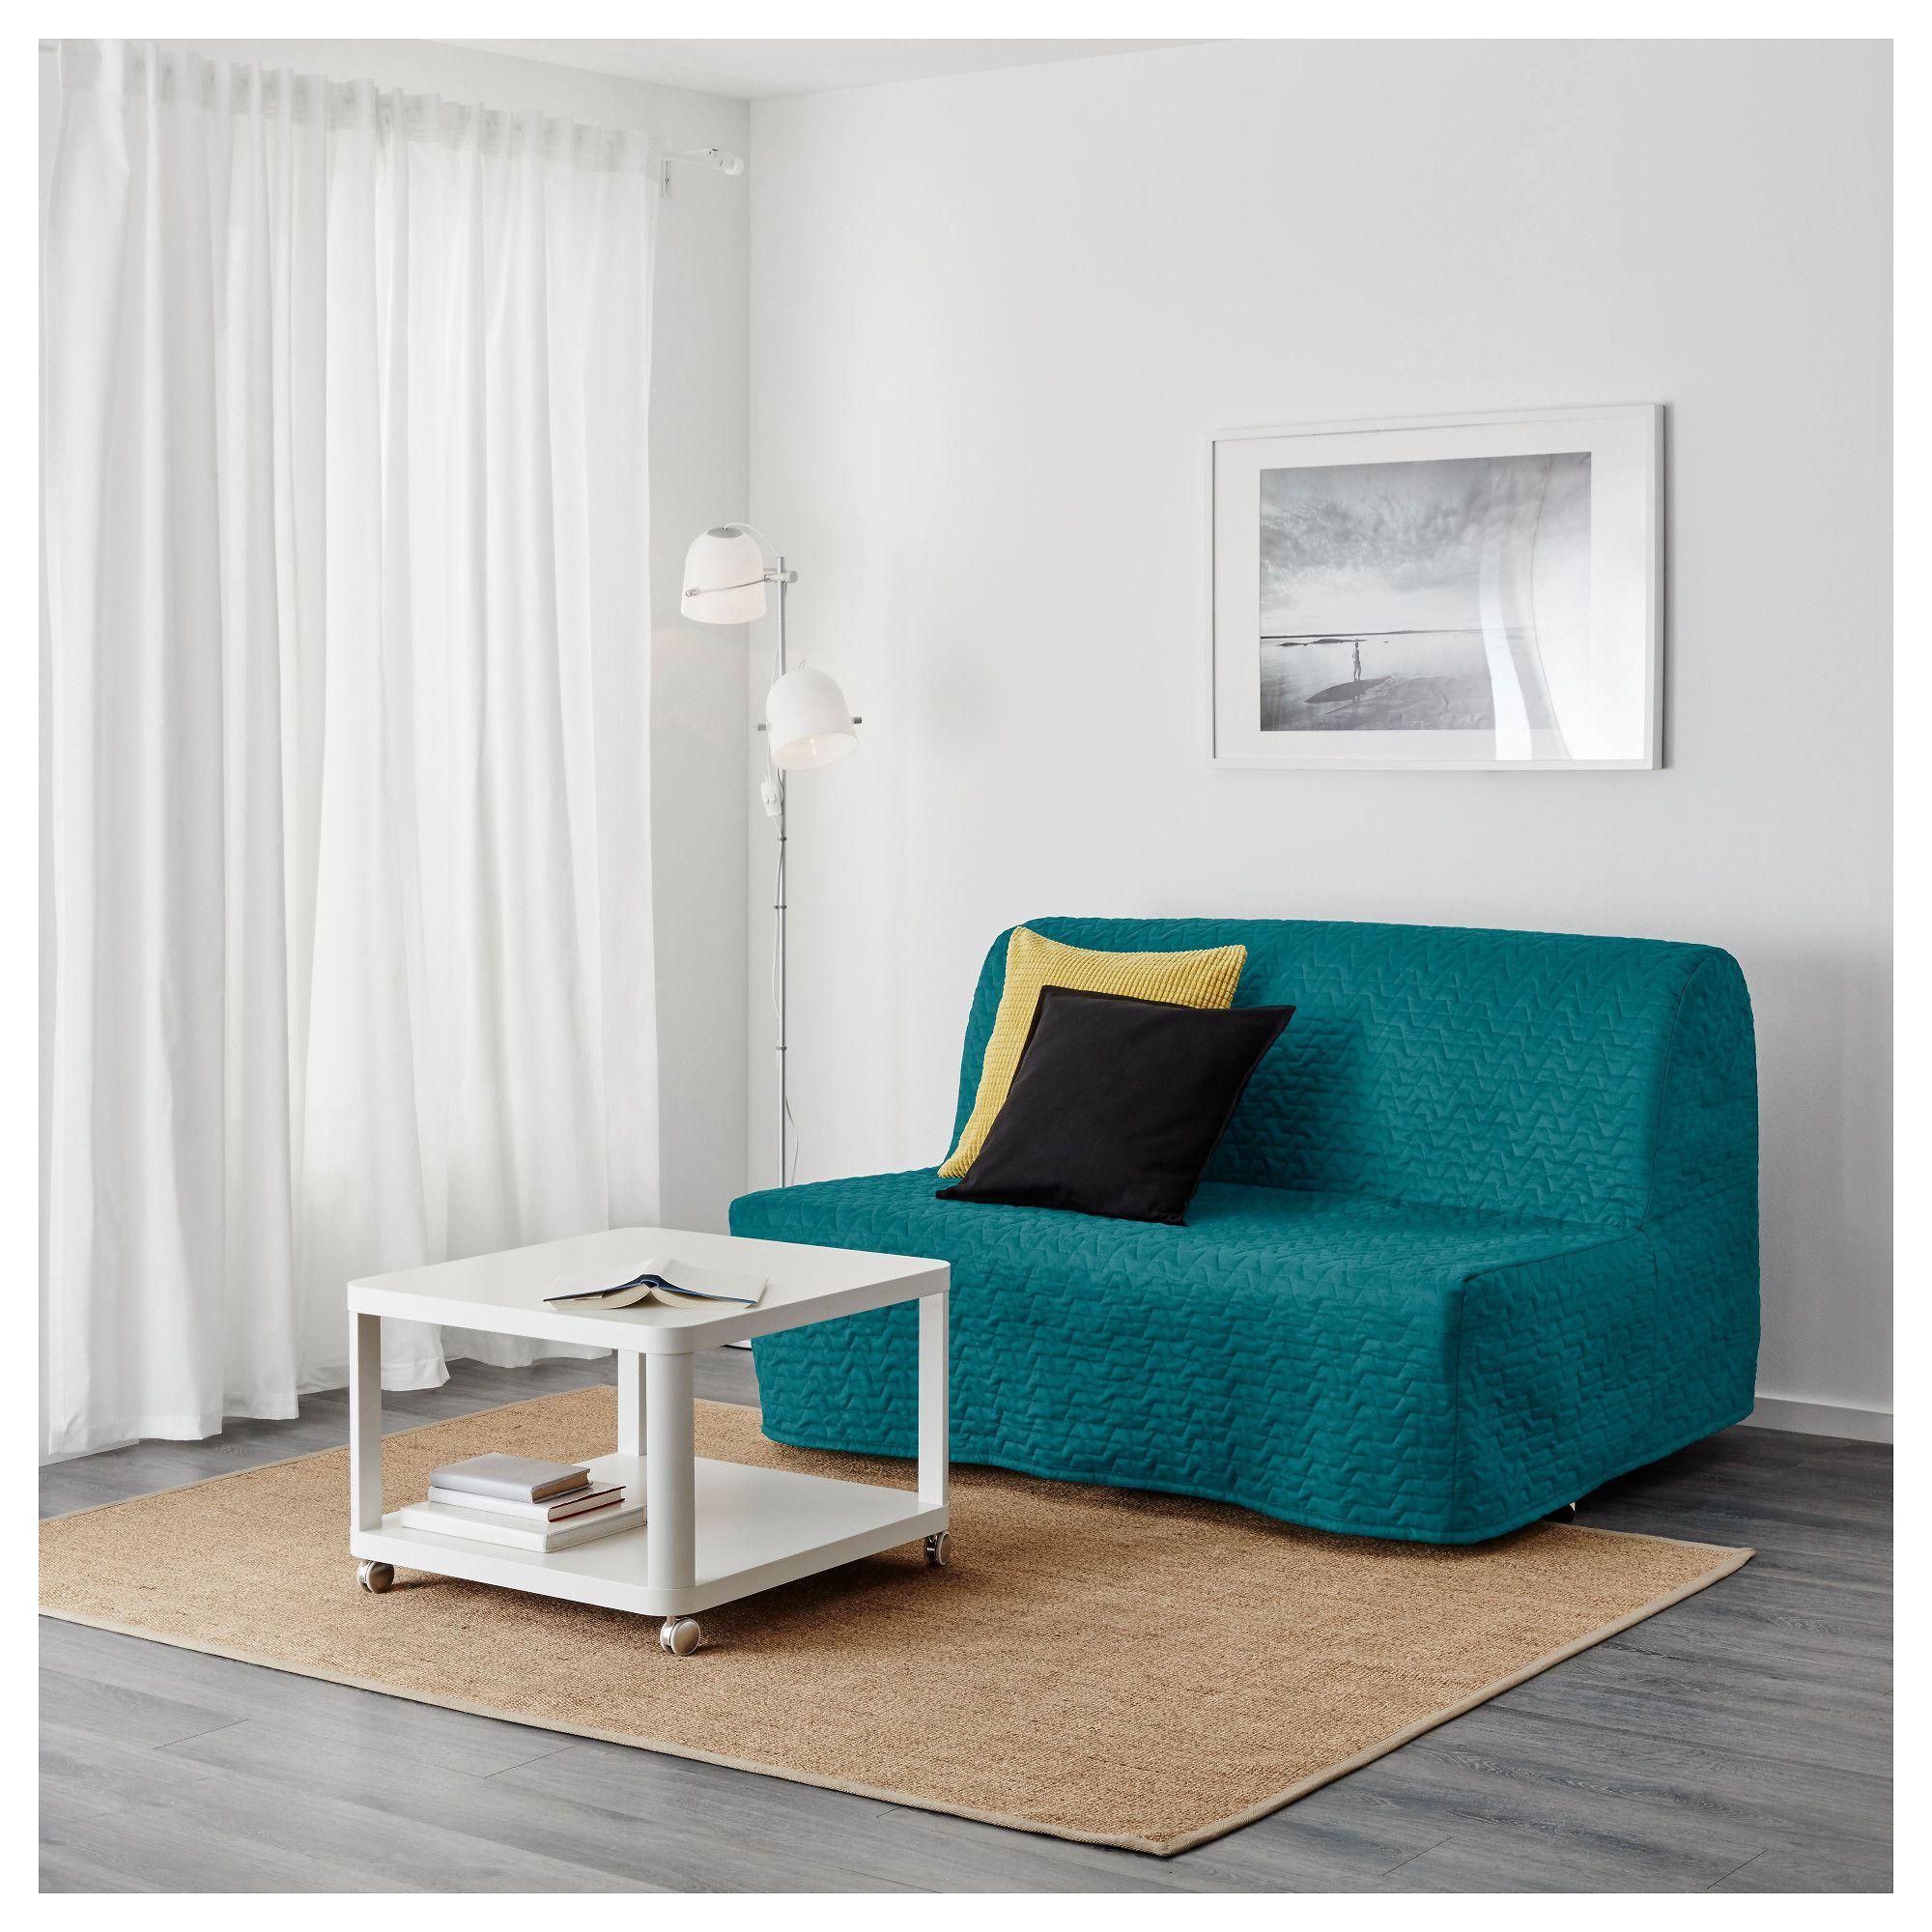 Lycksele Lövås Futon Vallarum Turquoise Mamatawe Sofa